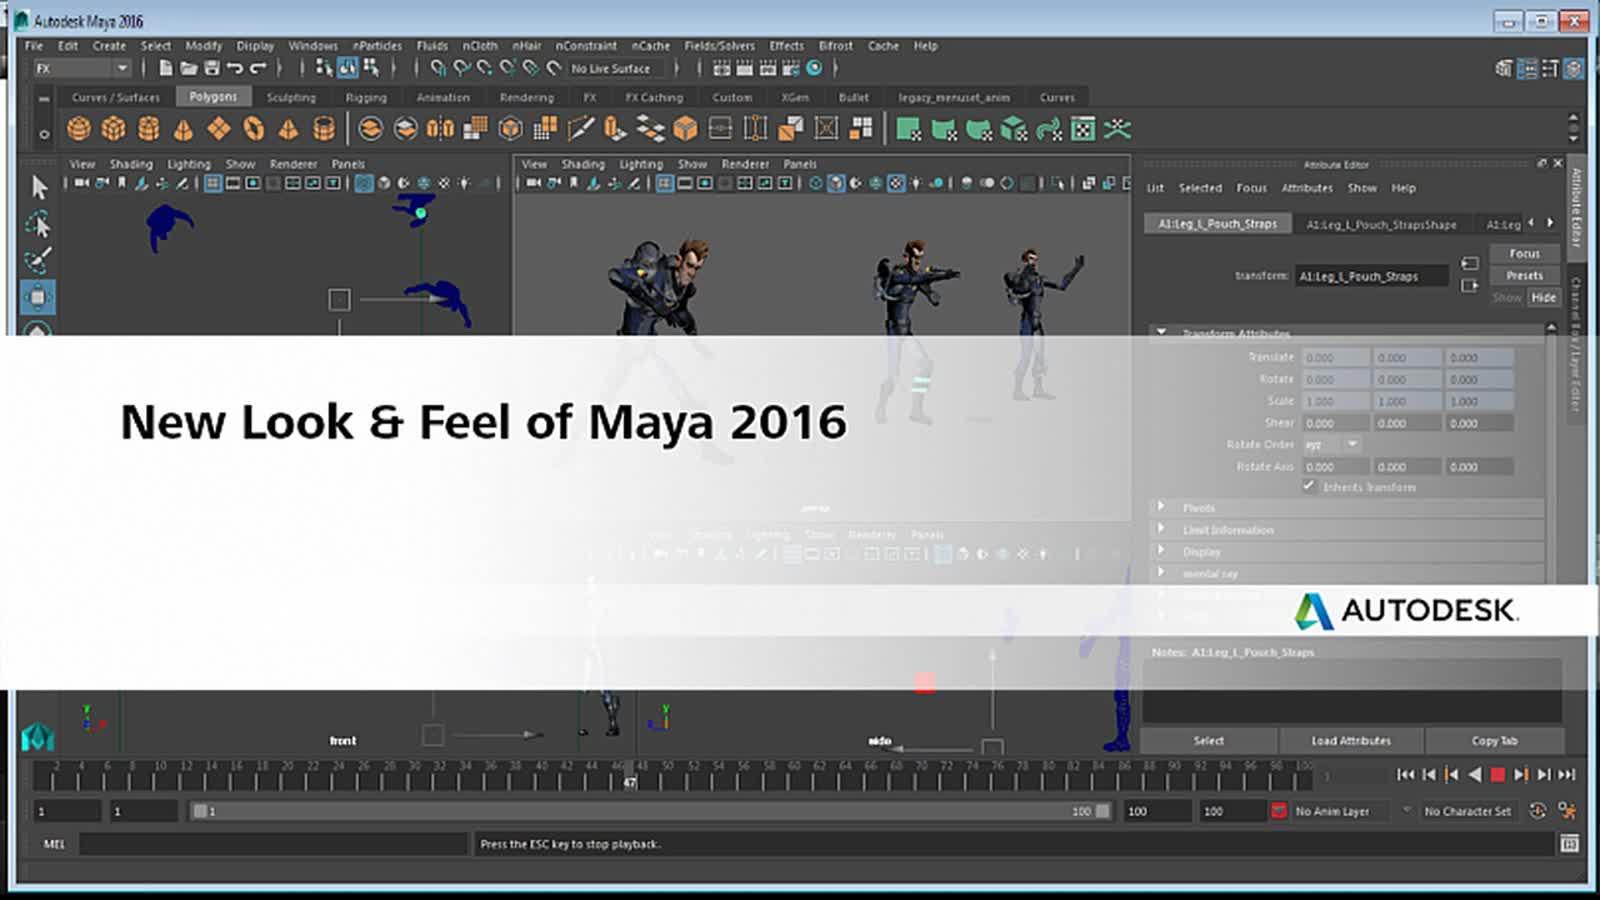 What's New in the Maya Interface   Maya 2016   Autodesk